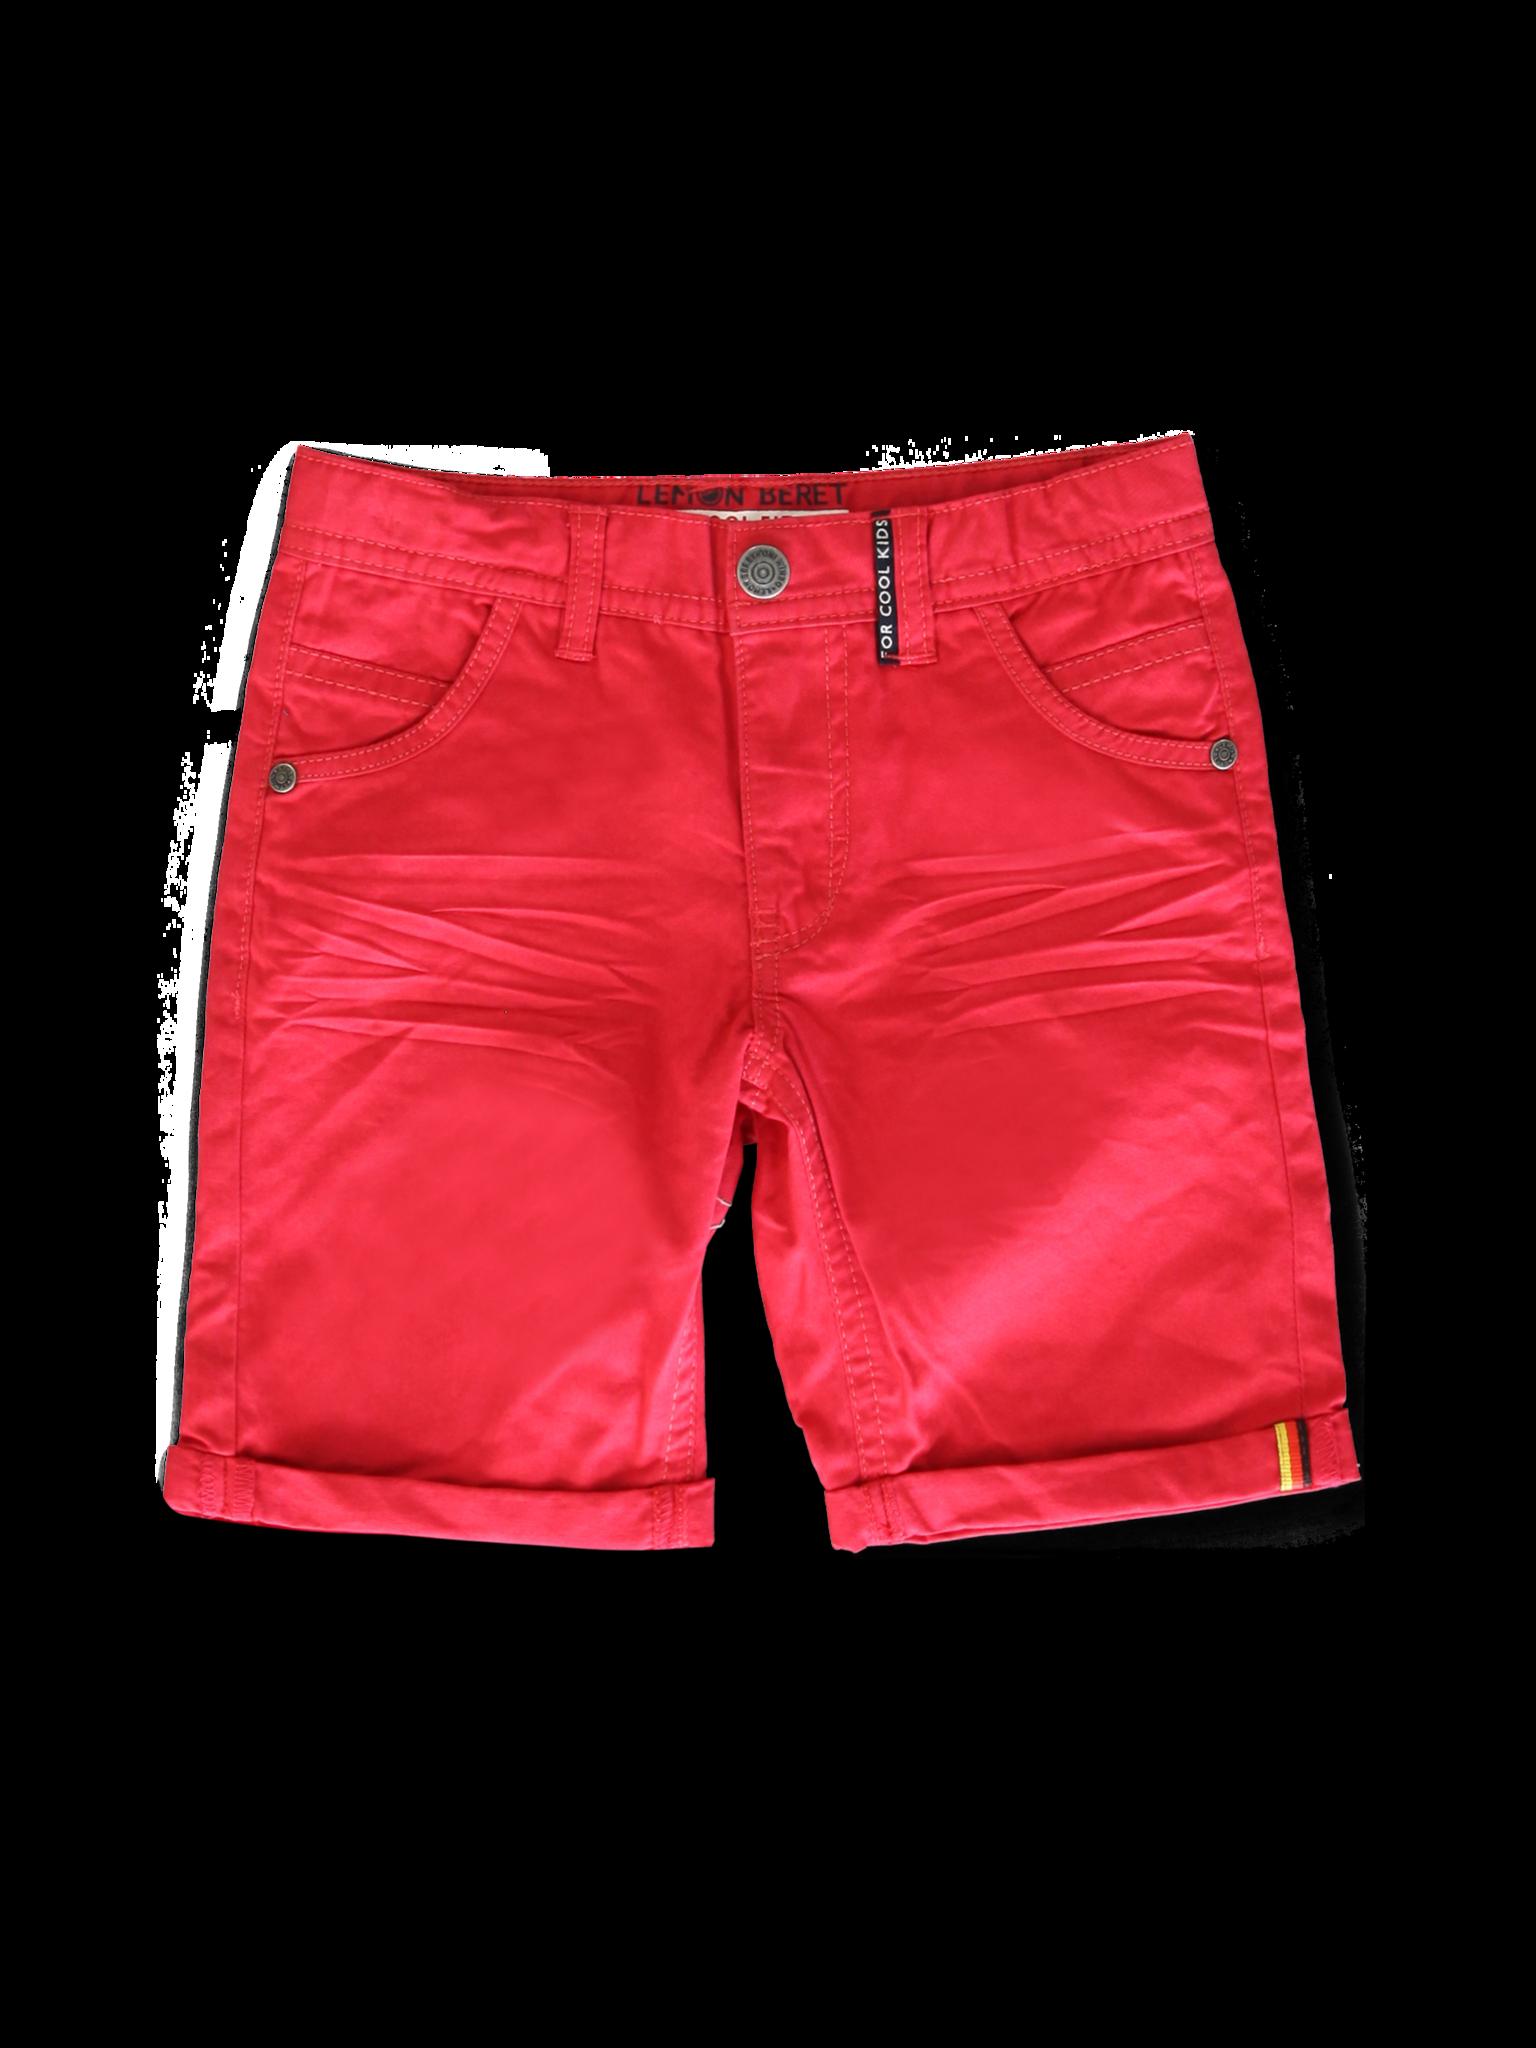 All Brands | Summerproducts Small Boys | Bermuda | 10 pcs/box